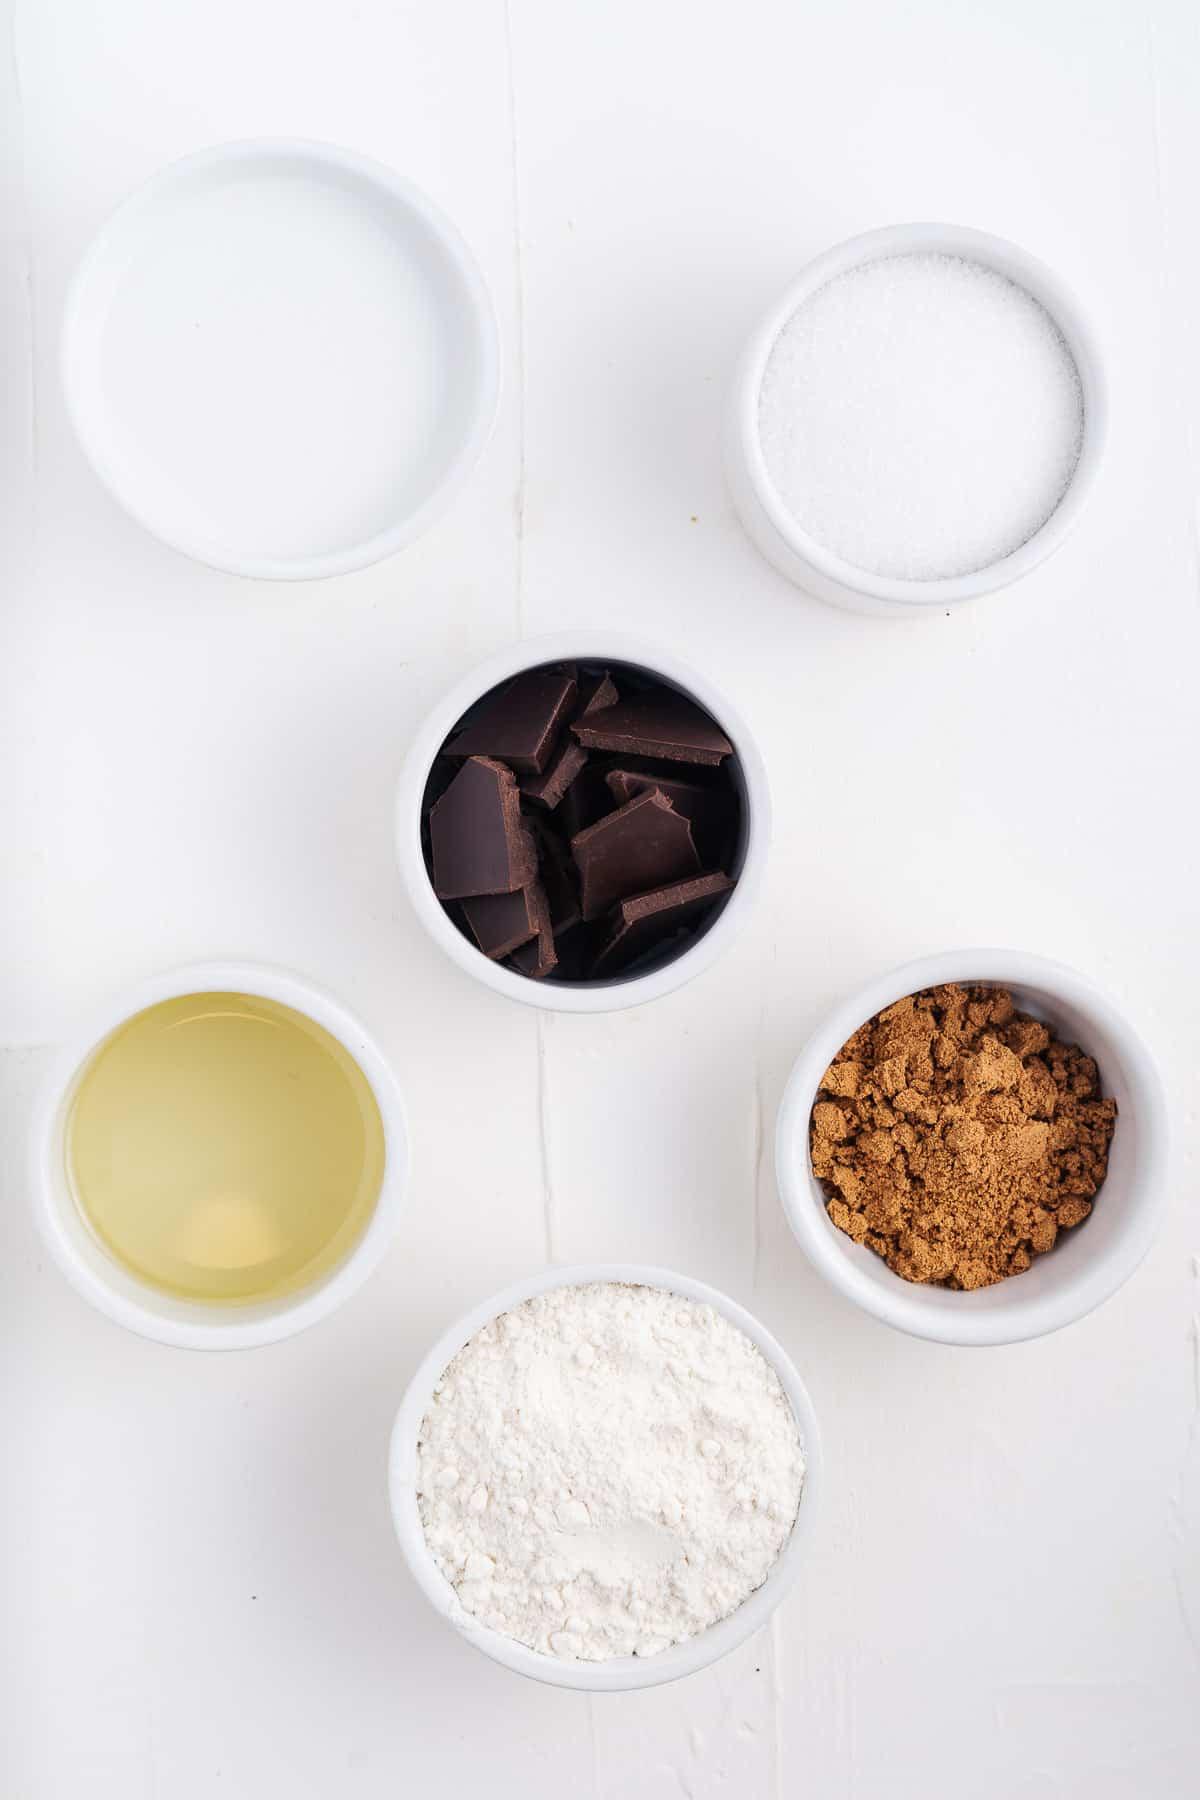 Oil, Milk, Sugar, Chocolate, Cinnamon, & Flour